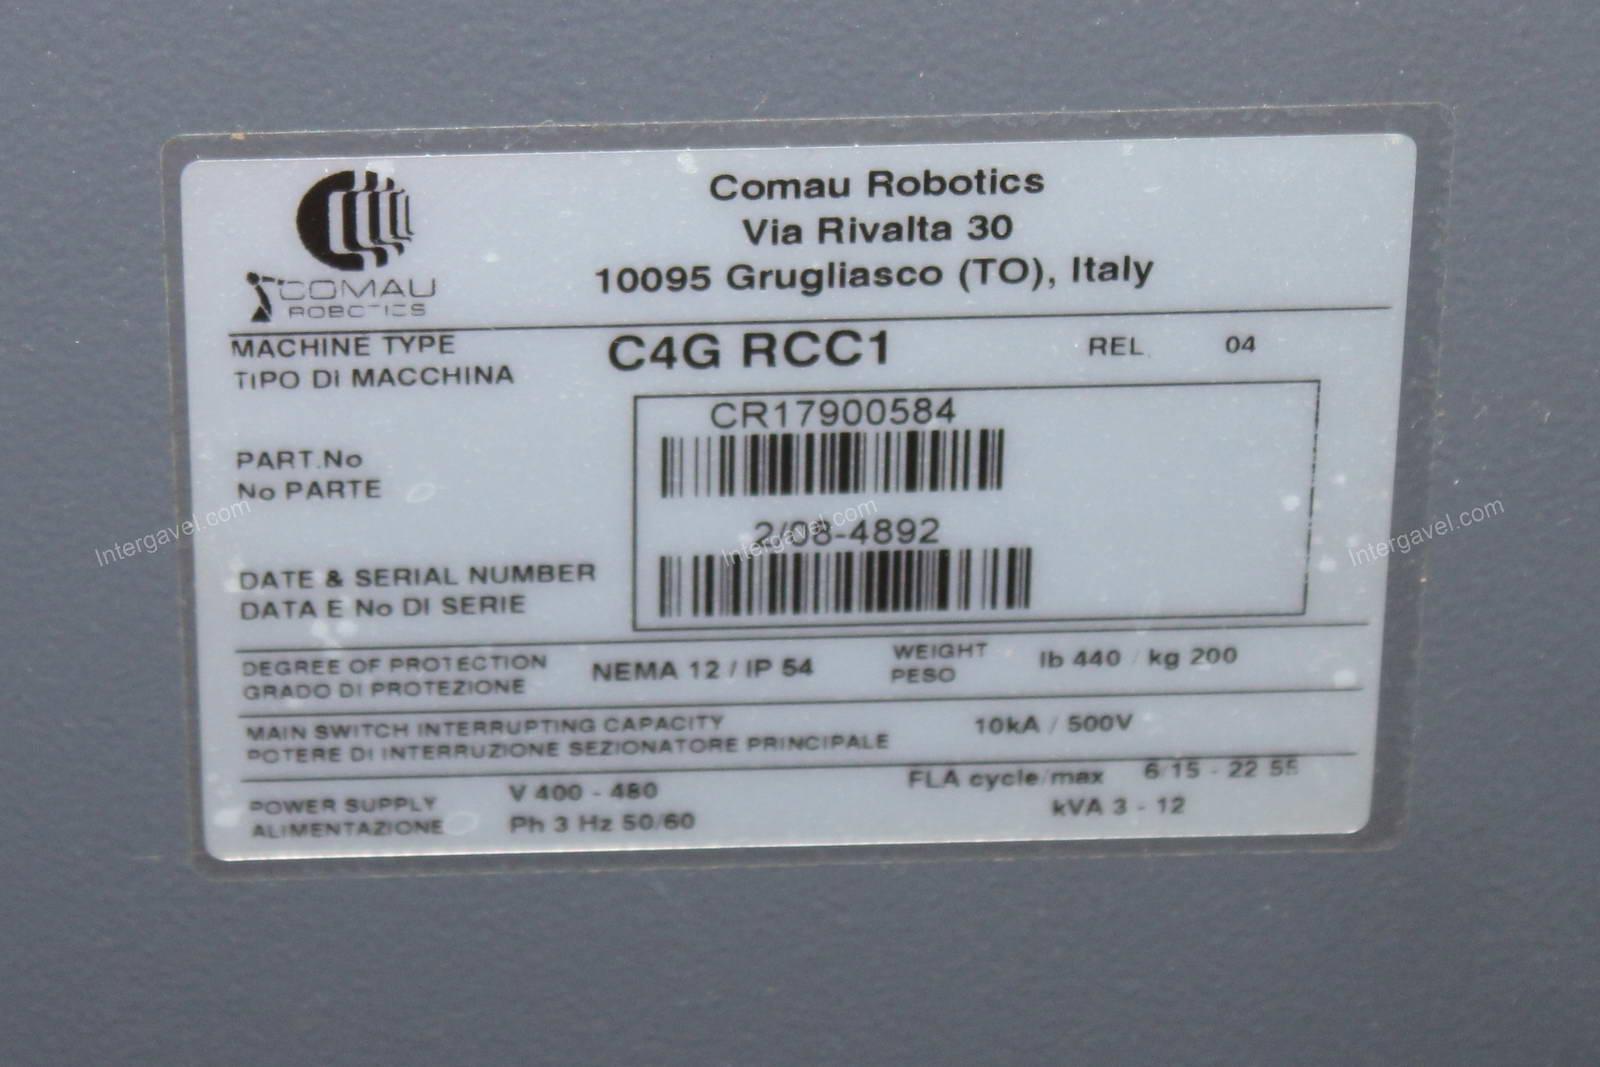 Robot - Smart NS12-1,85 Hand, C4G RCC1; Comau